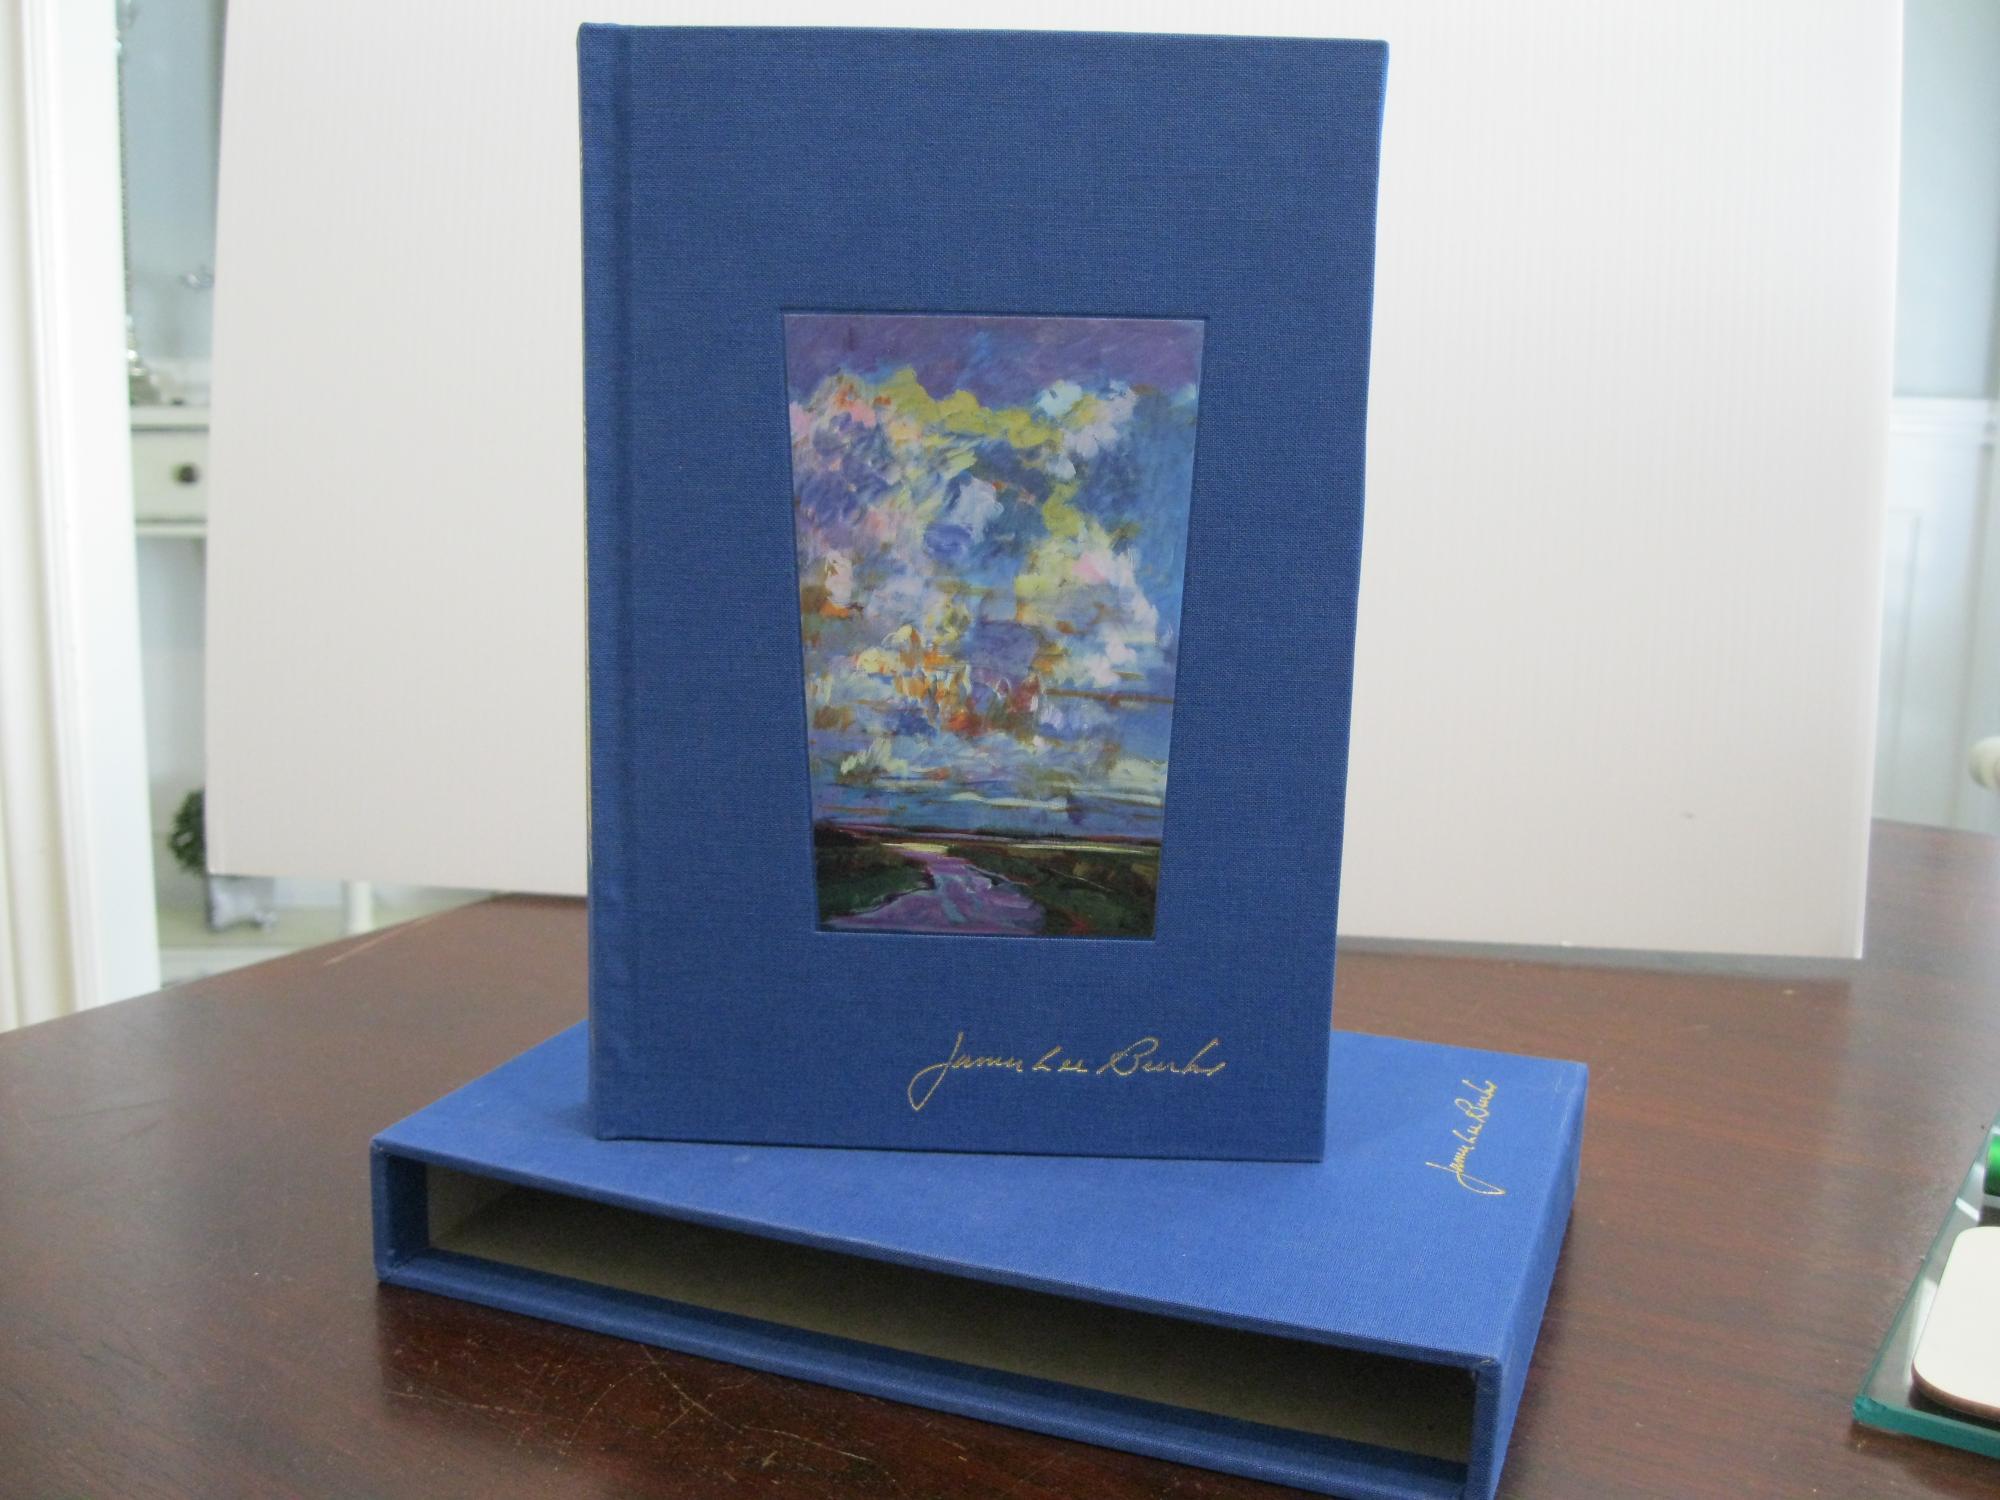 CADILLAC_JUKEBOX_*SIGNED_LIMITED_EDITION*_BURKE_JAMES_LEE_Fine_Hardcover